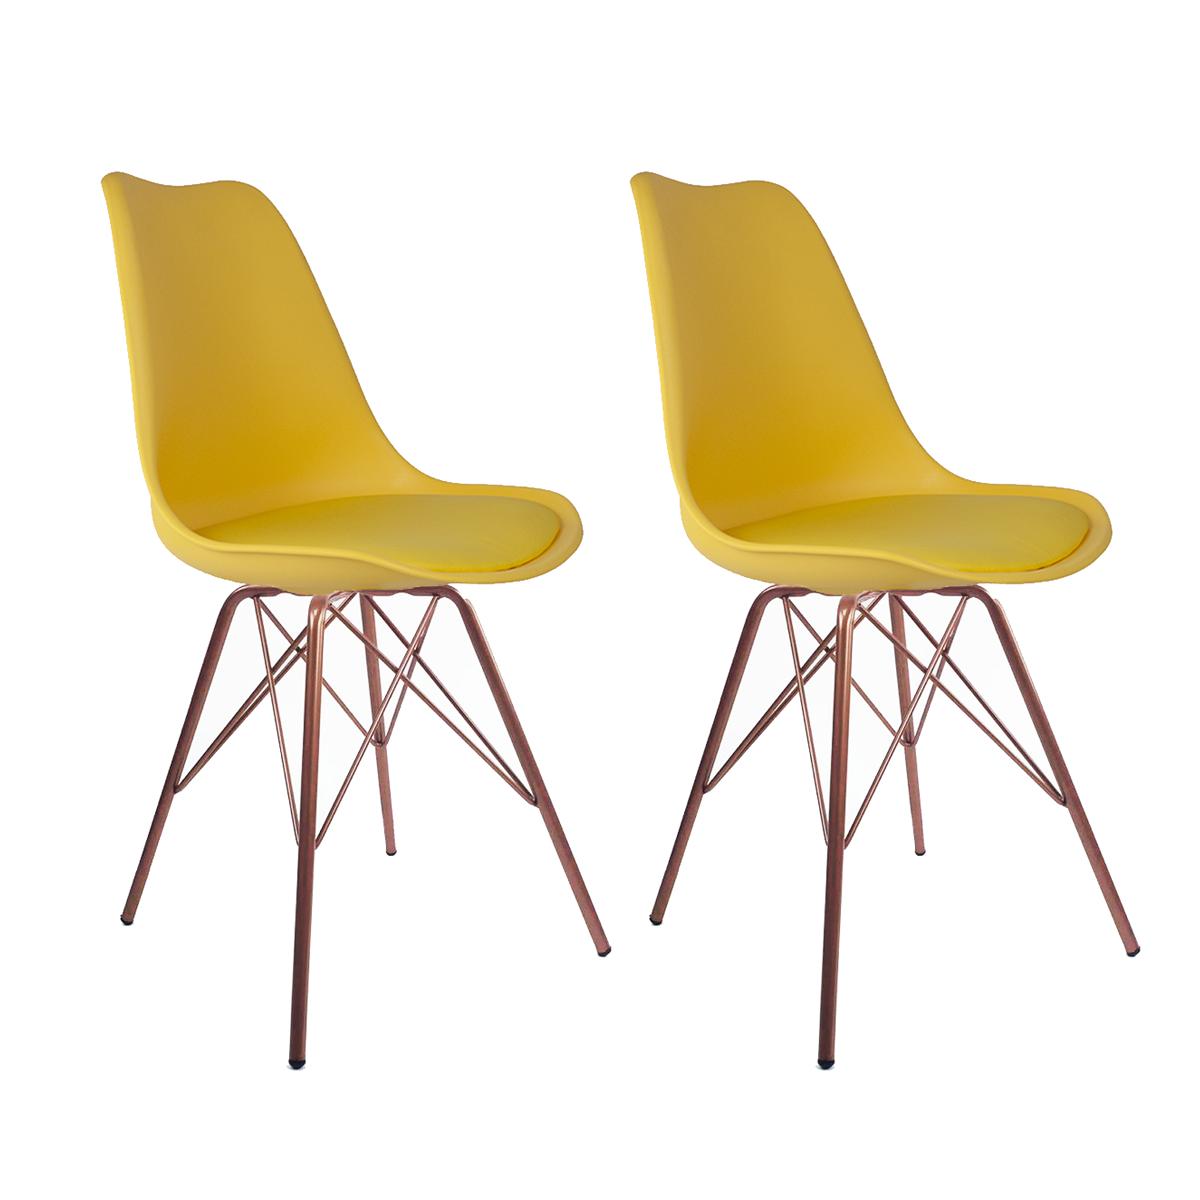 Conjunto com 2 Cadeiras Saarinen Amarela - Base Tower Cobre